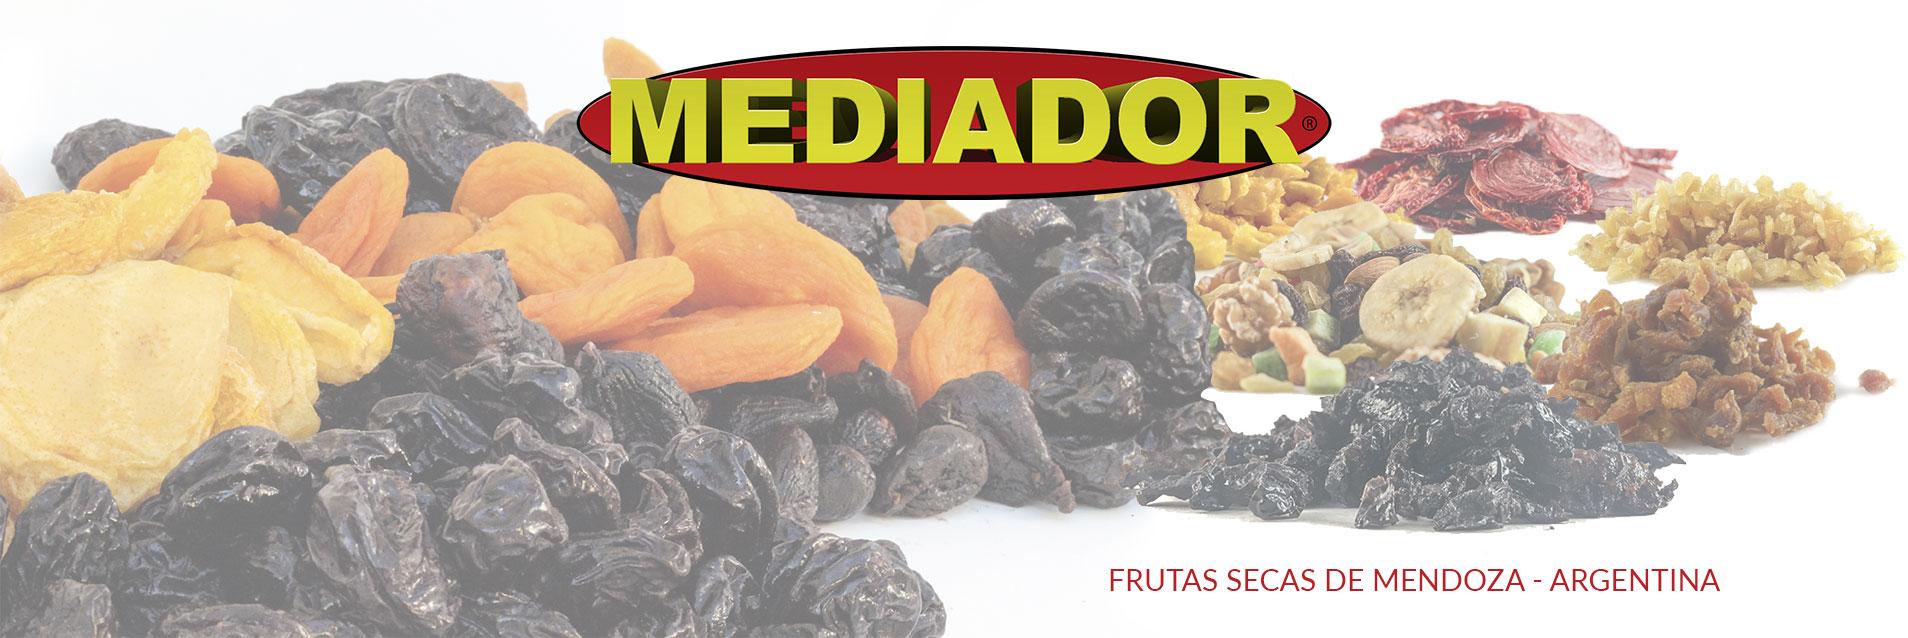 frutas secas mediador